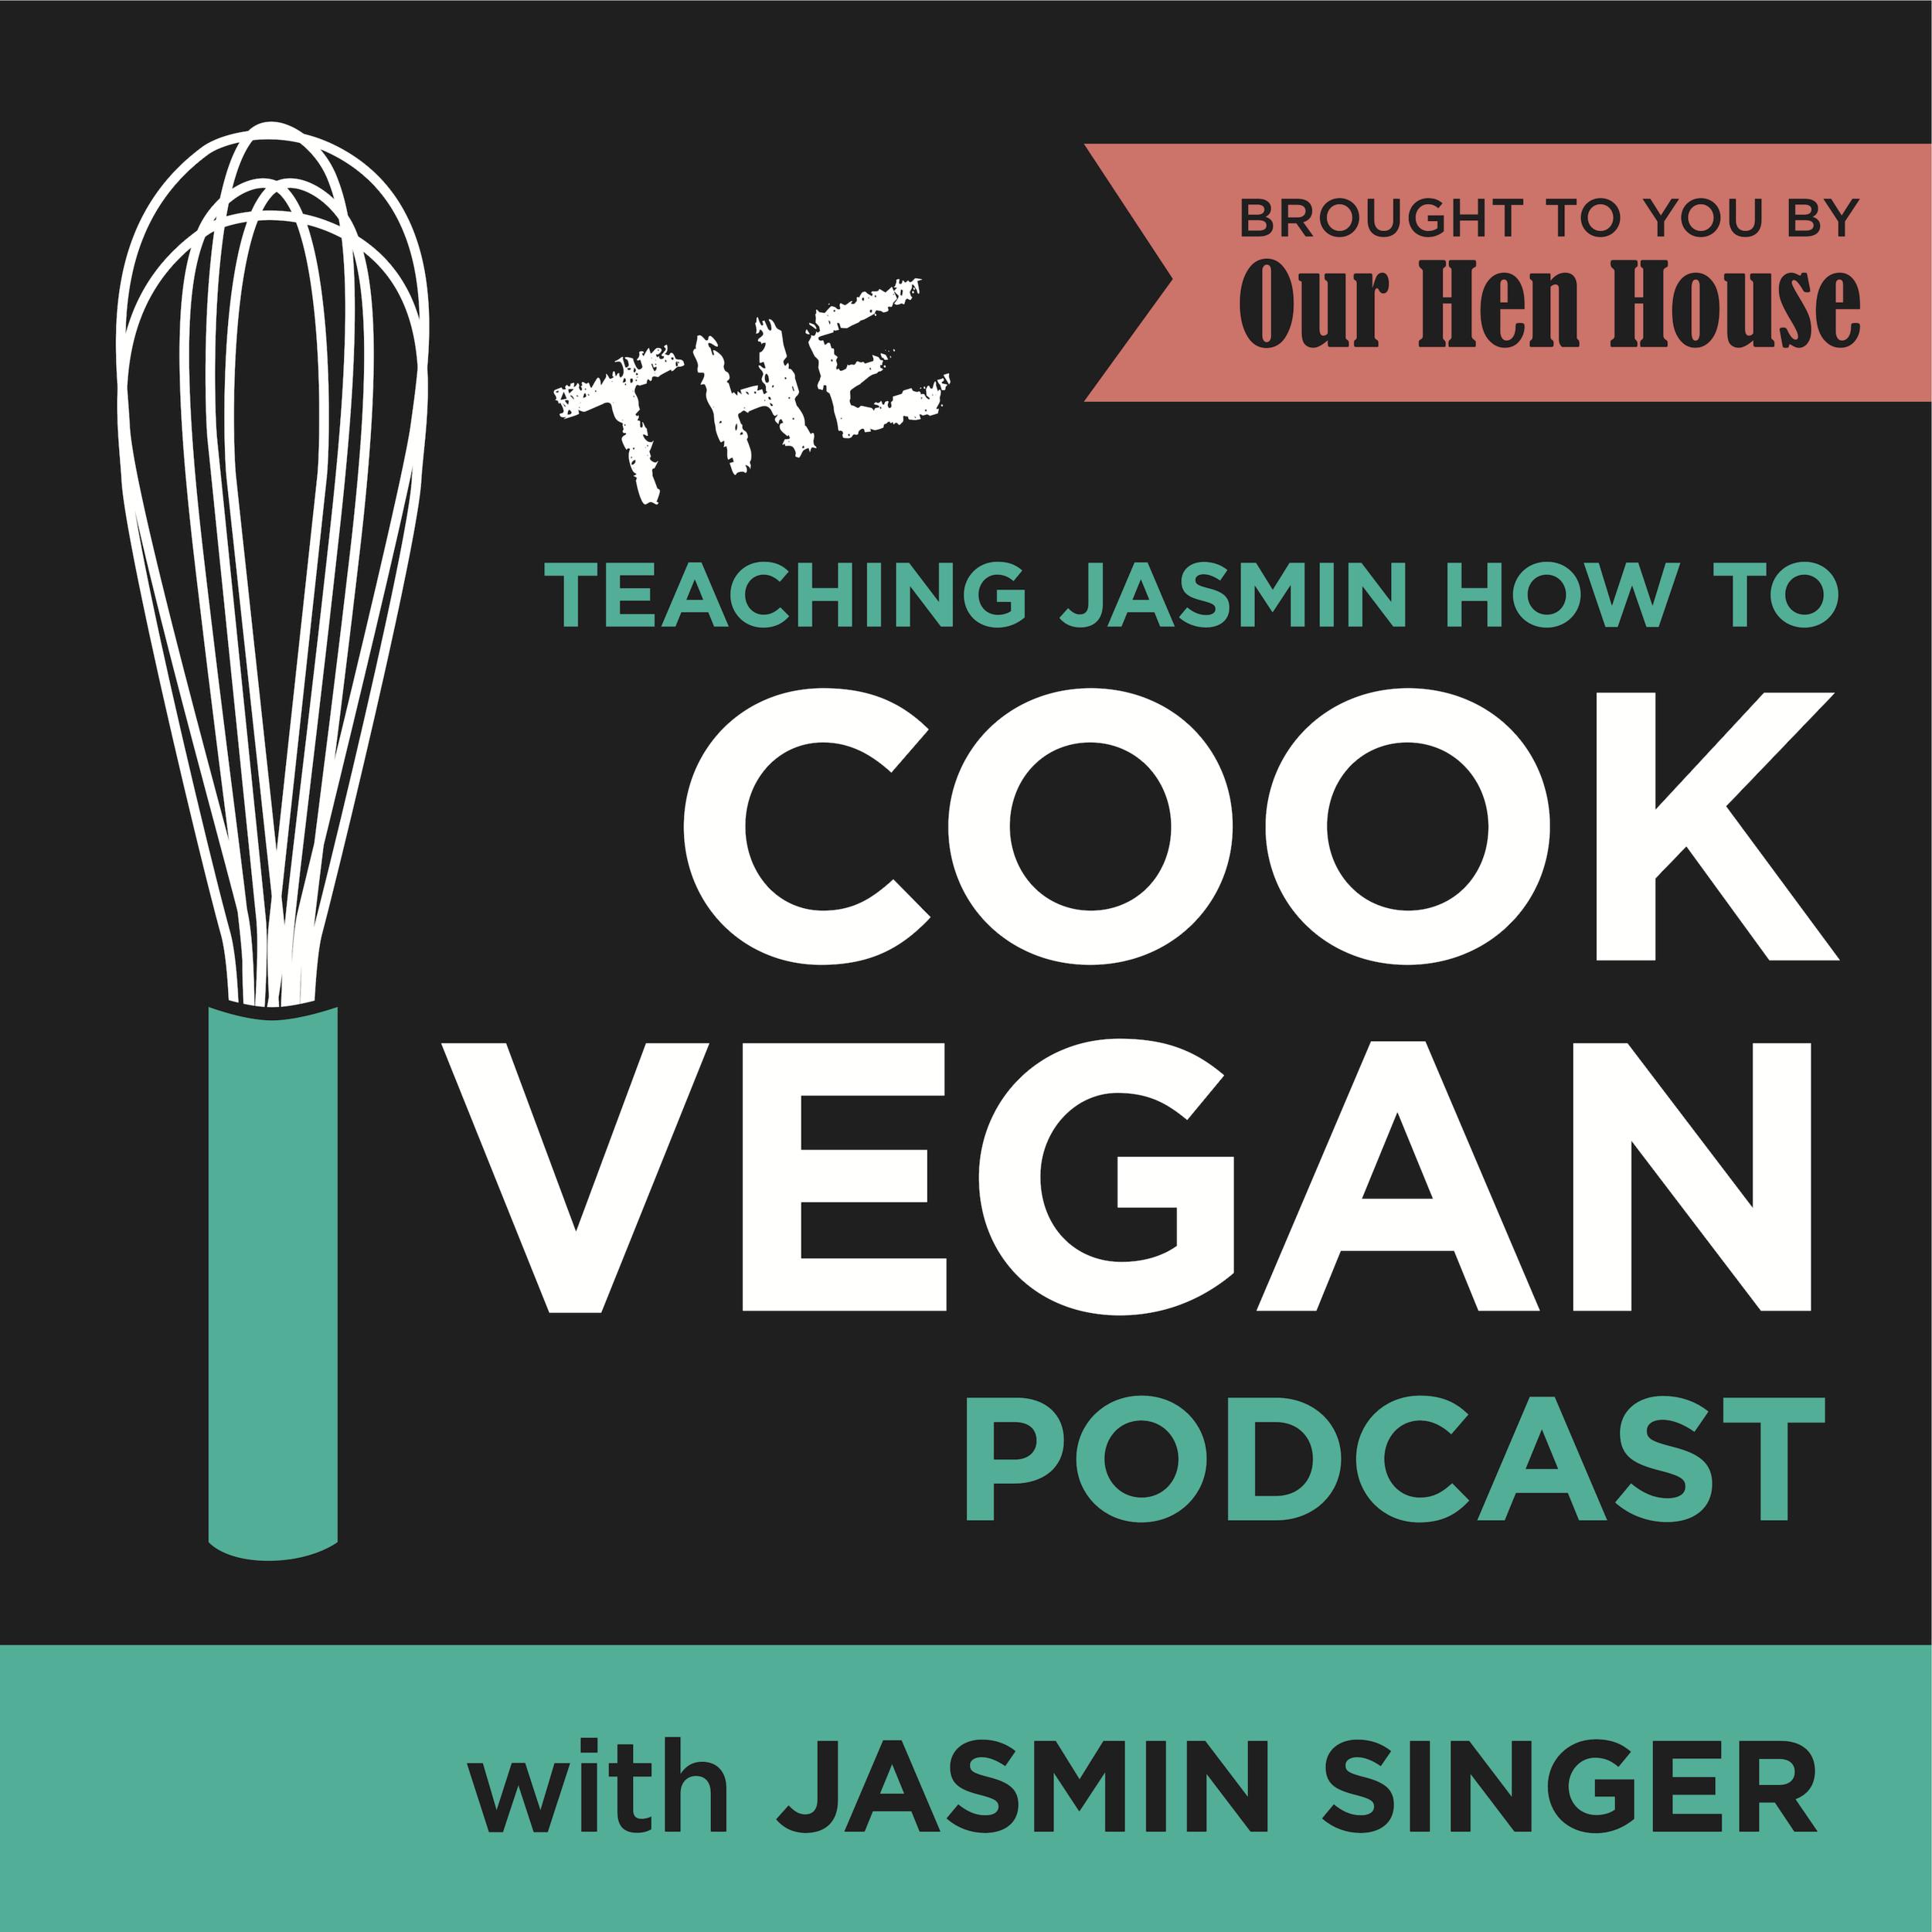 Teaching Jasmin how to cook vegan -